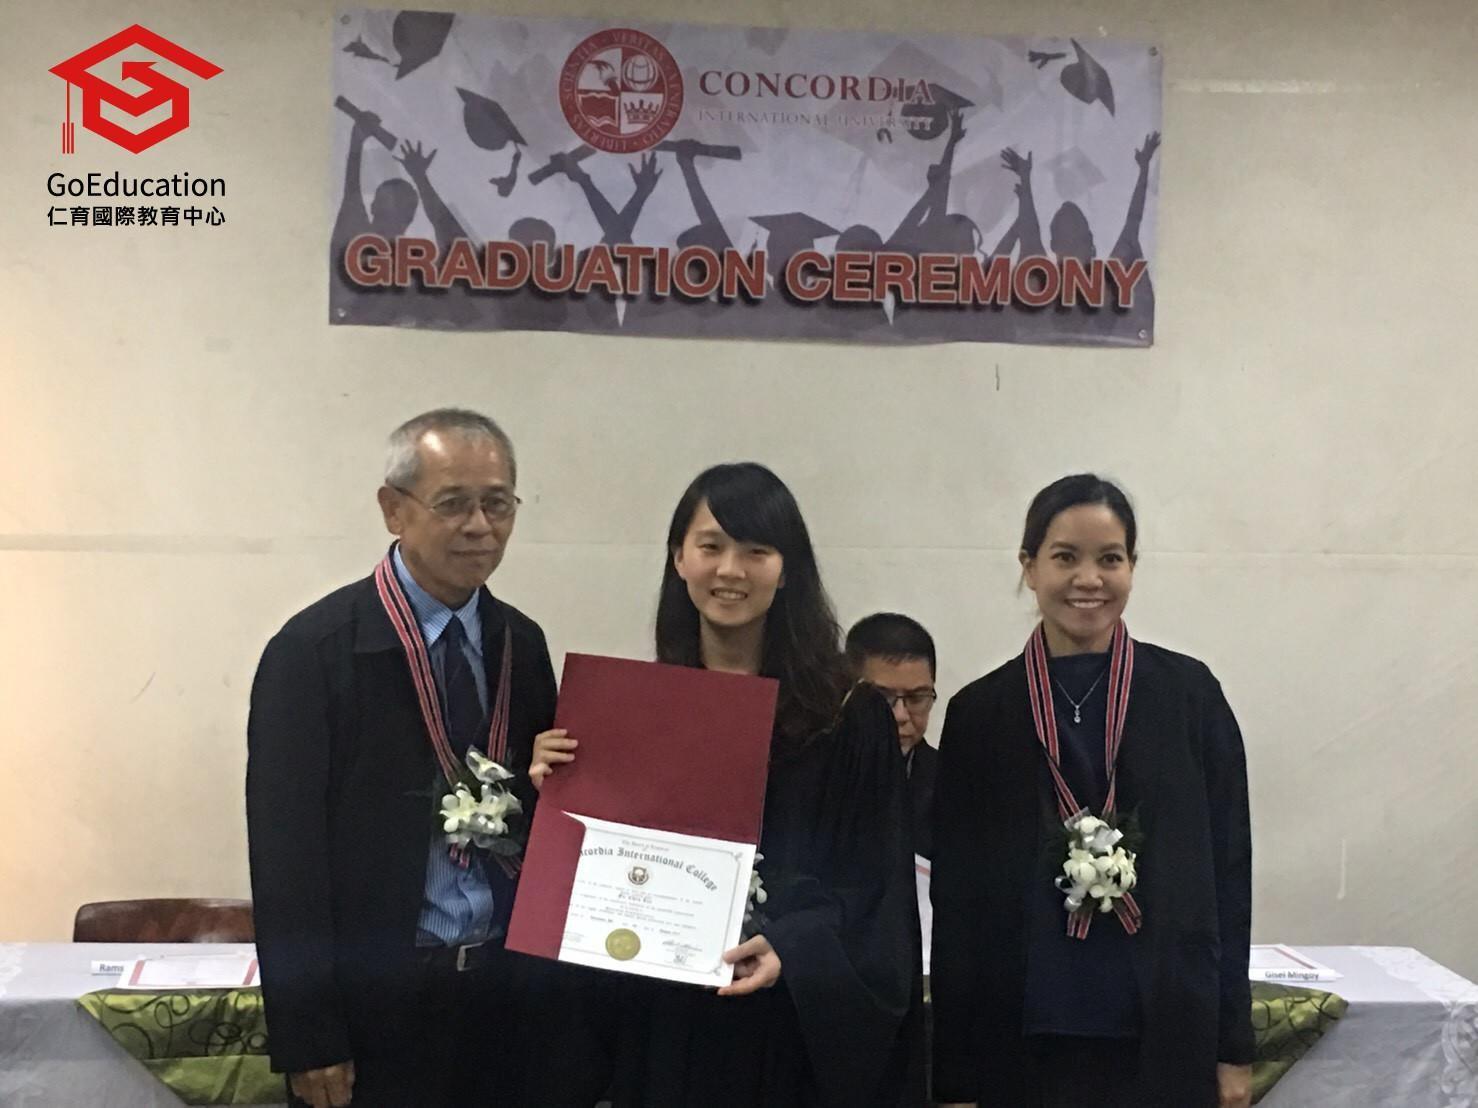 HELPx Concorida 暑假密集英語專班菲律賓遊學團畢業典禮